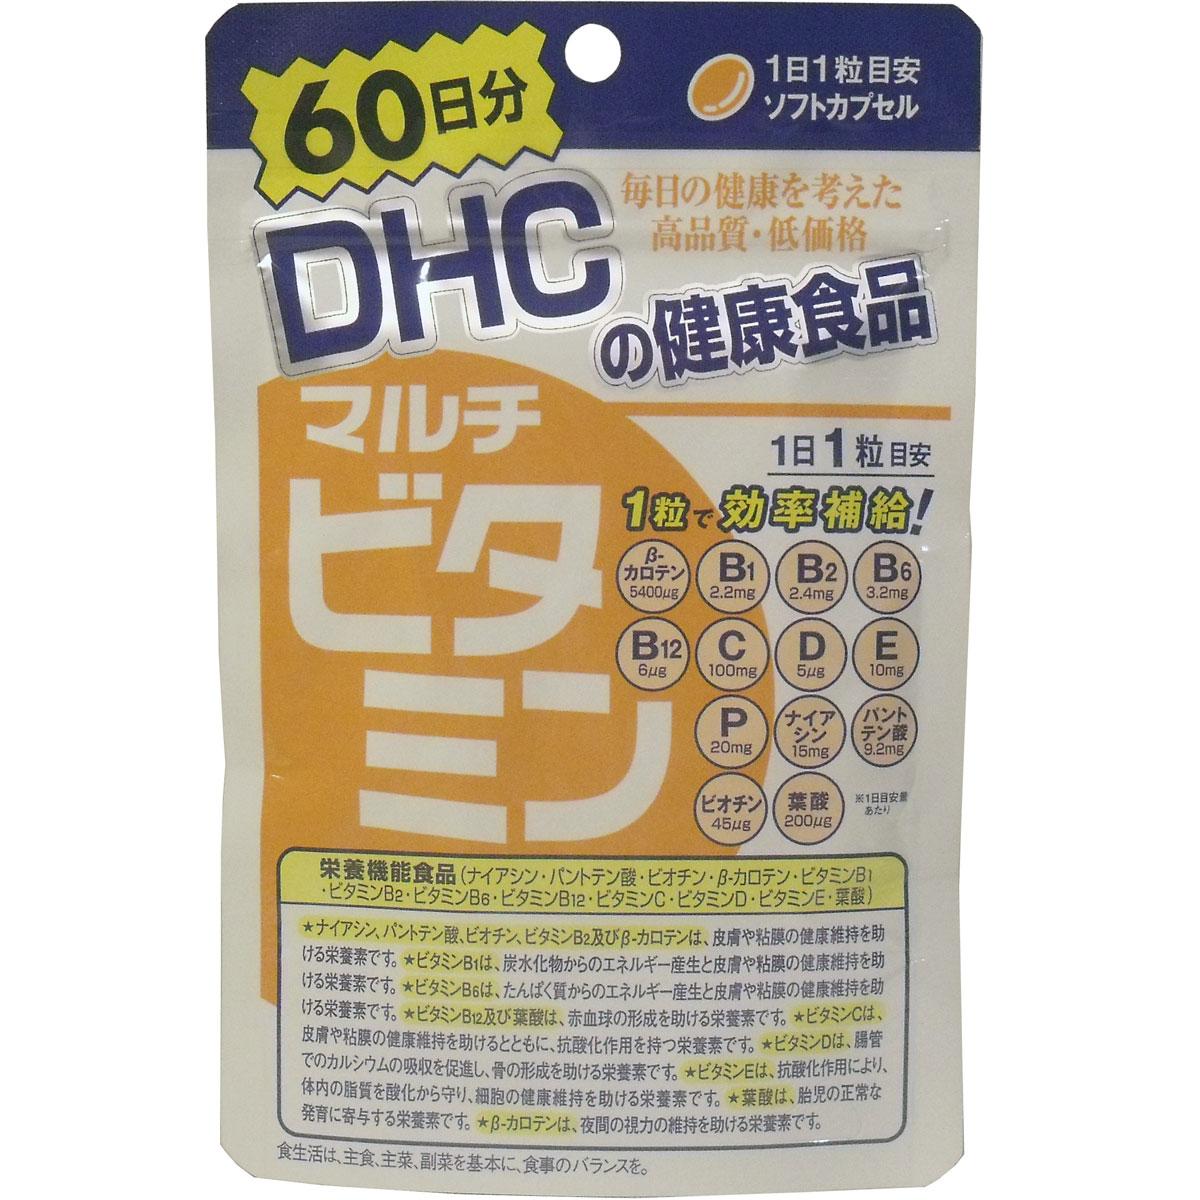 DHC 營養補給品 綜合維他命 60日份(60粒)